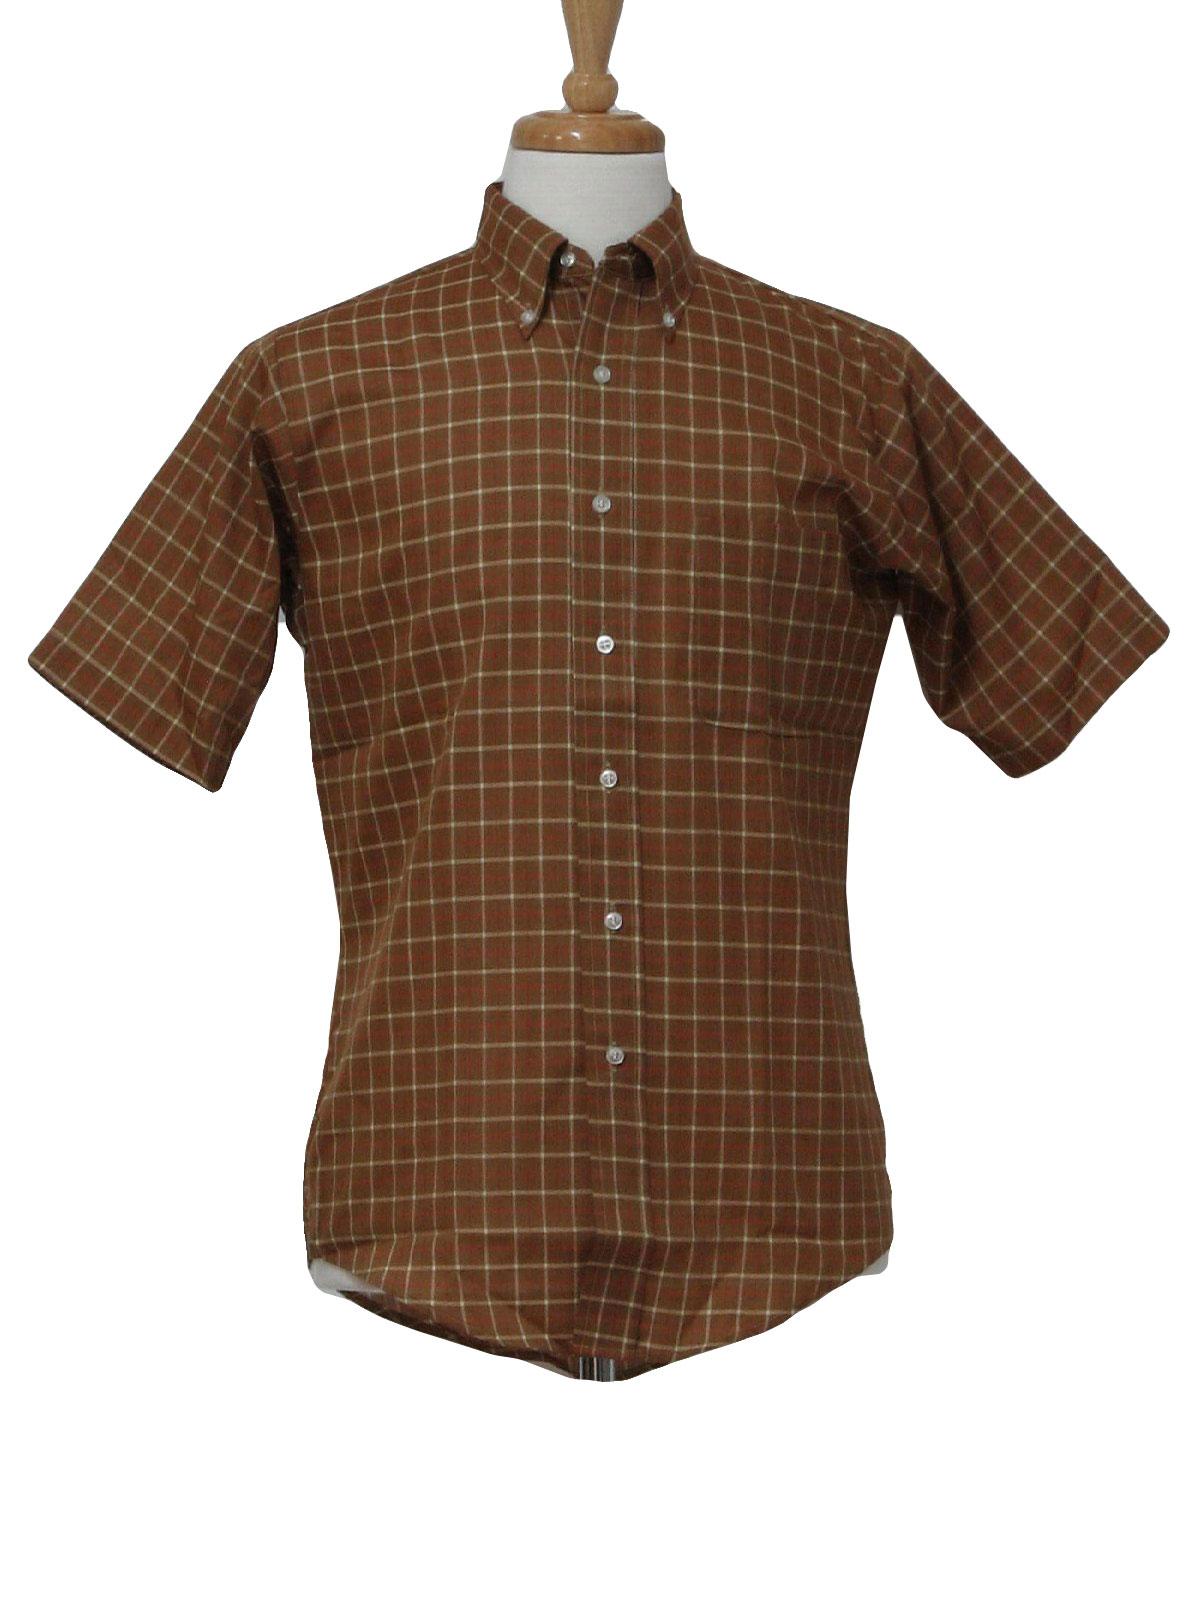 1960s Shirt Puritan Early 60s Puritan Mens Sandy Brown Red